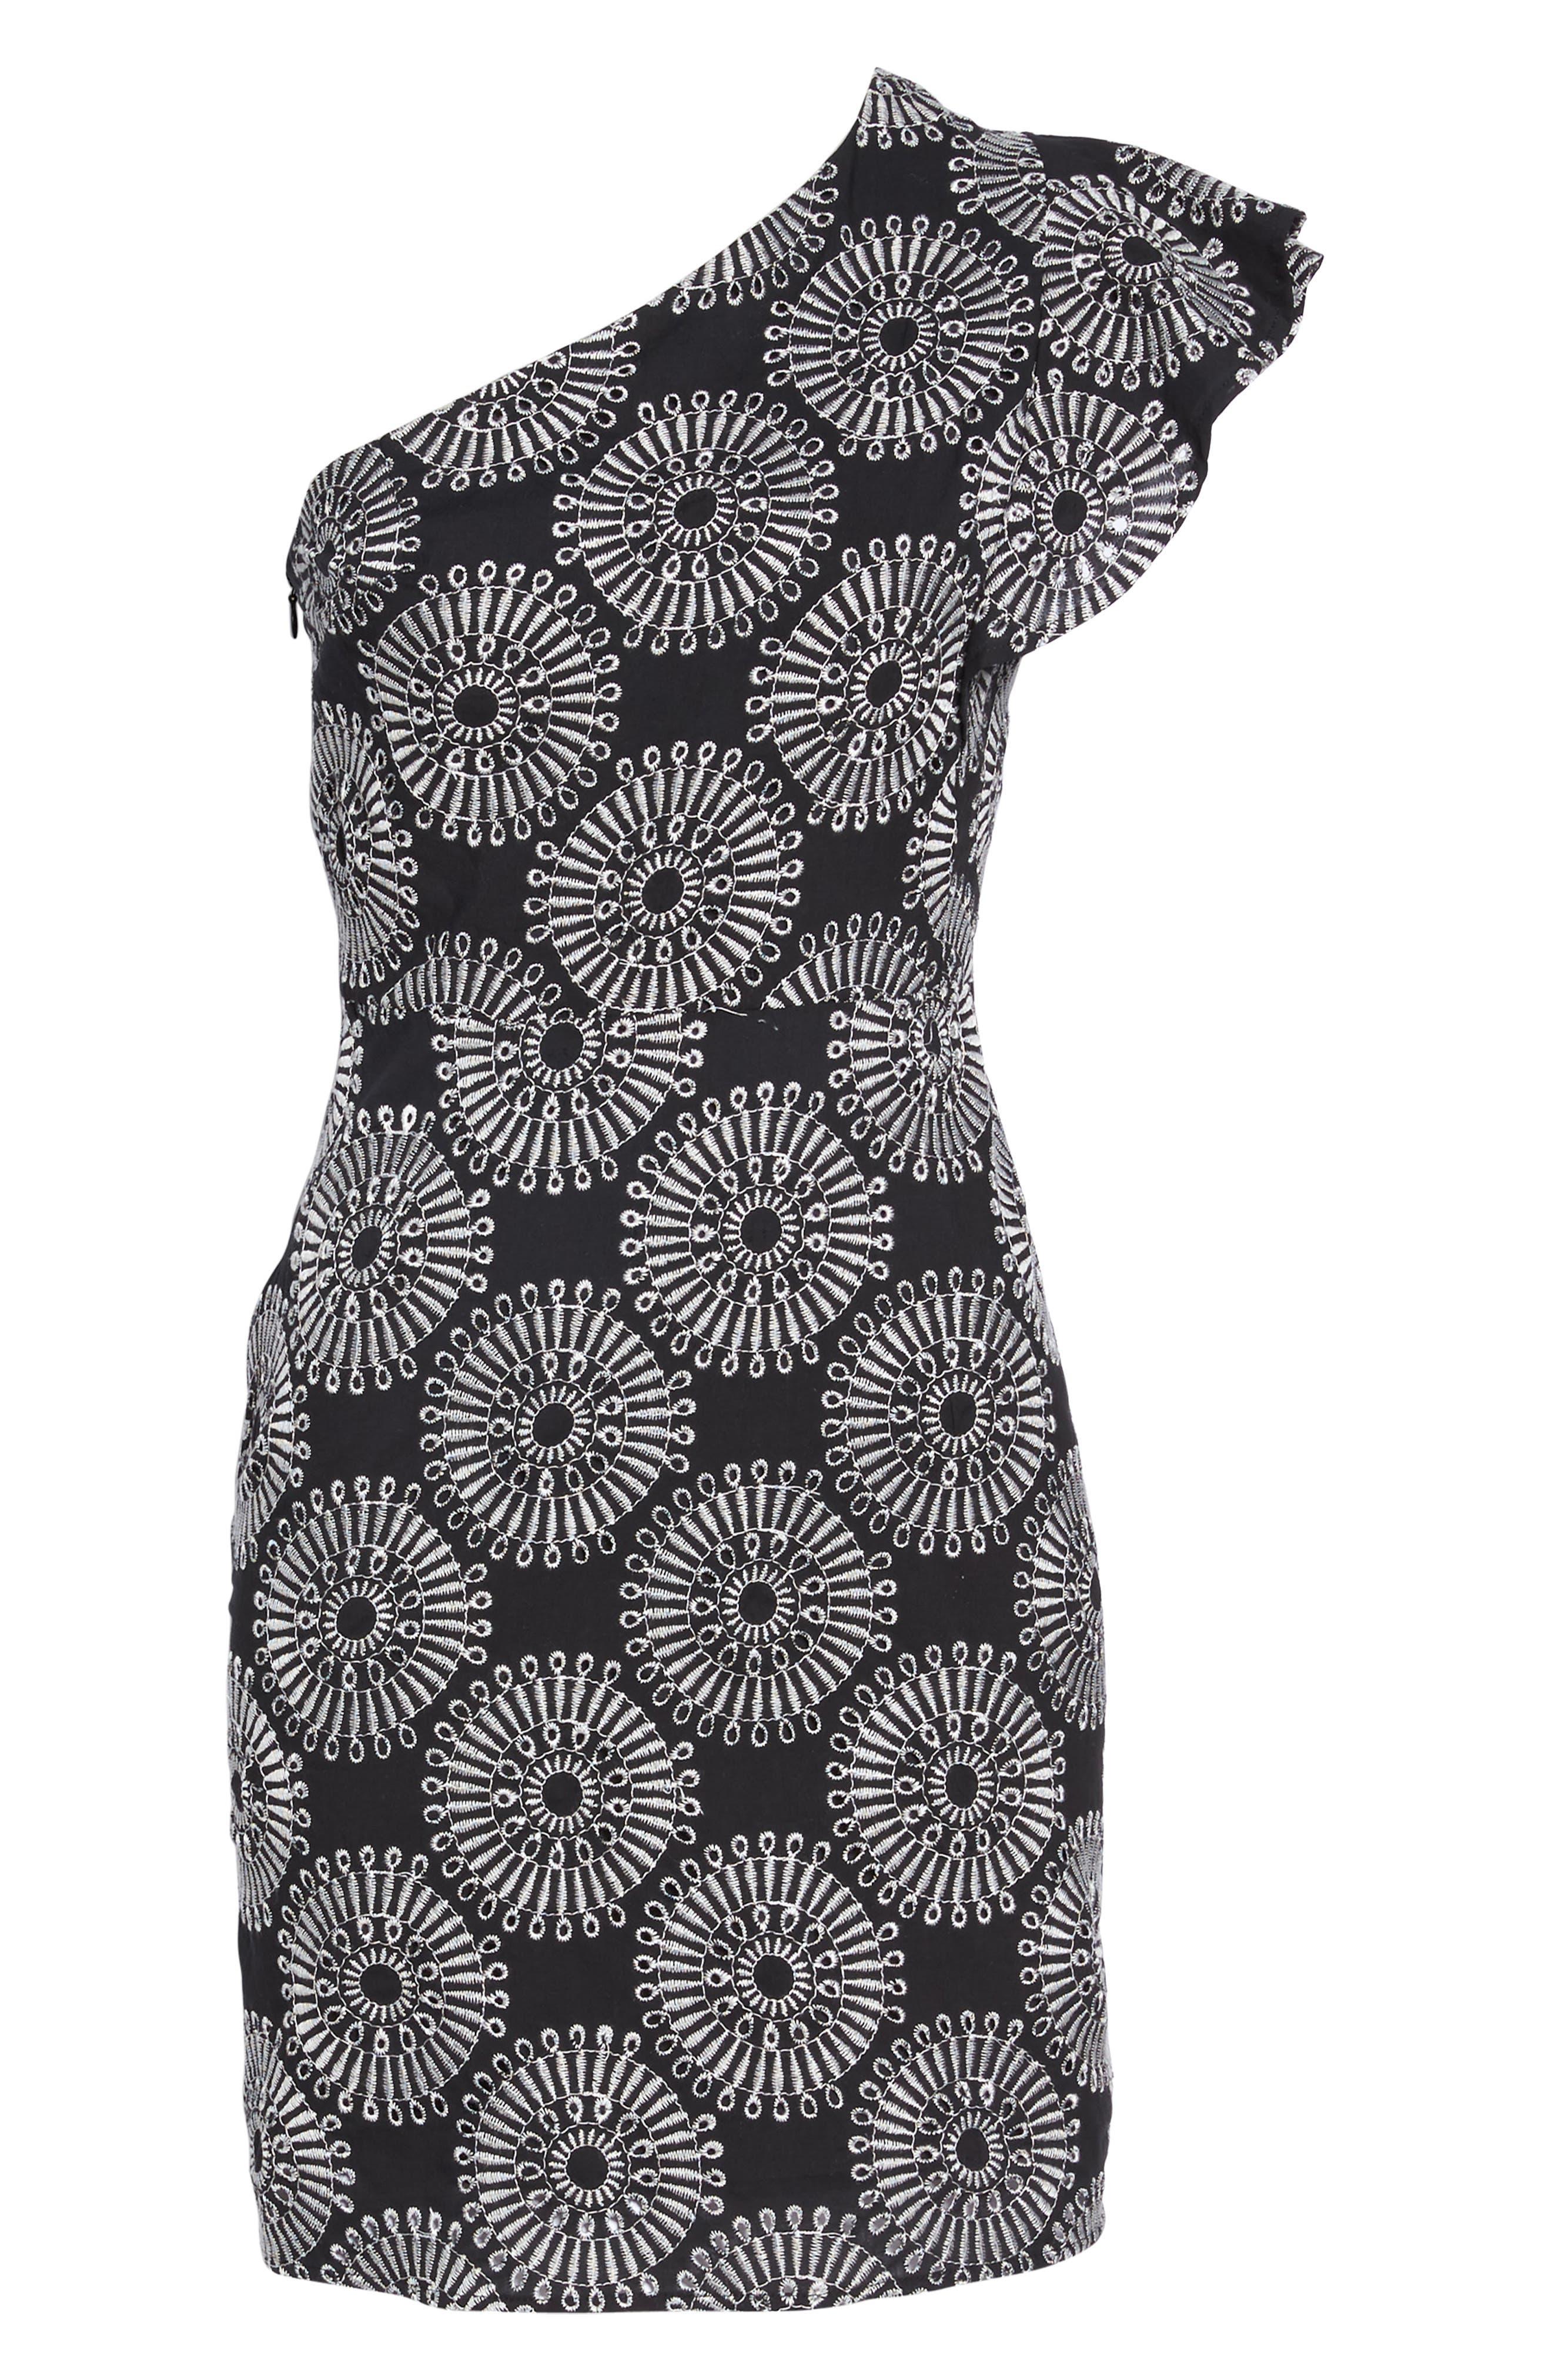 SAM EDELMAN,                             Embroidered One-Shoulder Sheath Dress,                             Alternate thumbnail 6, color,                             001